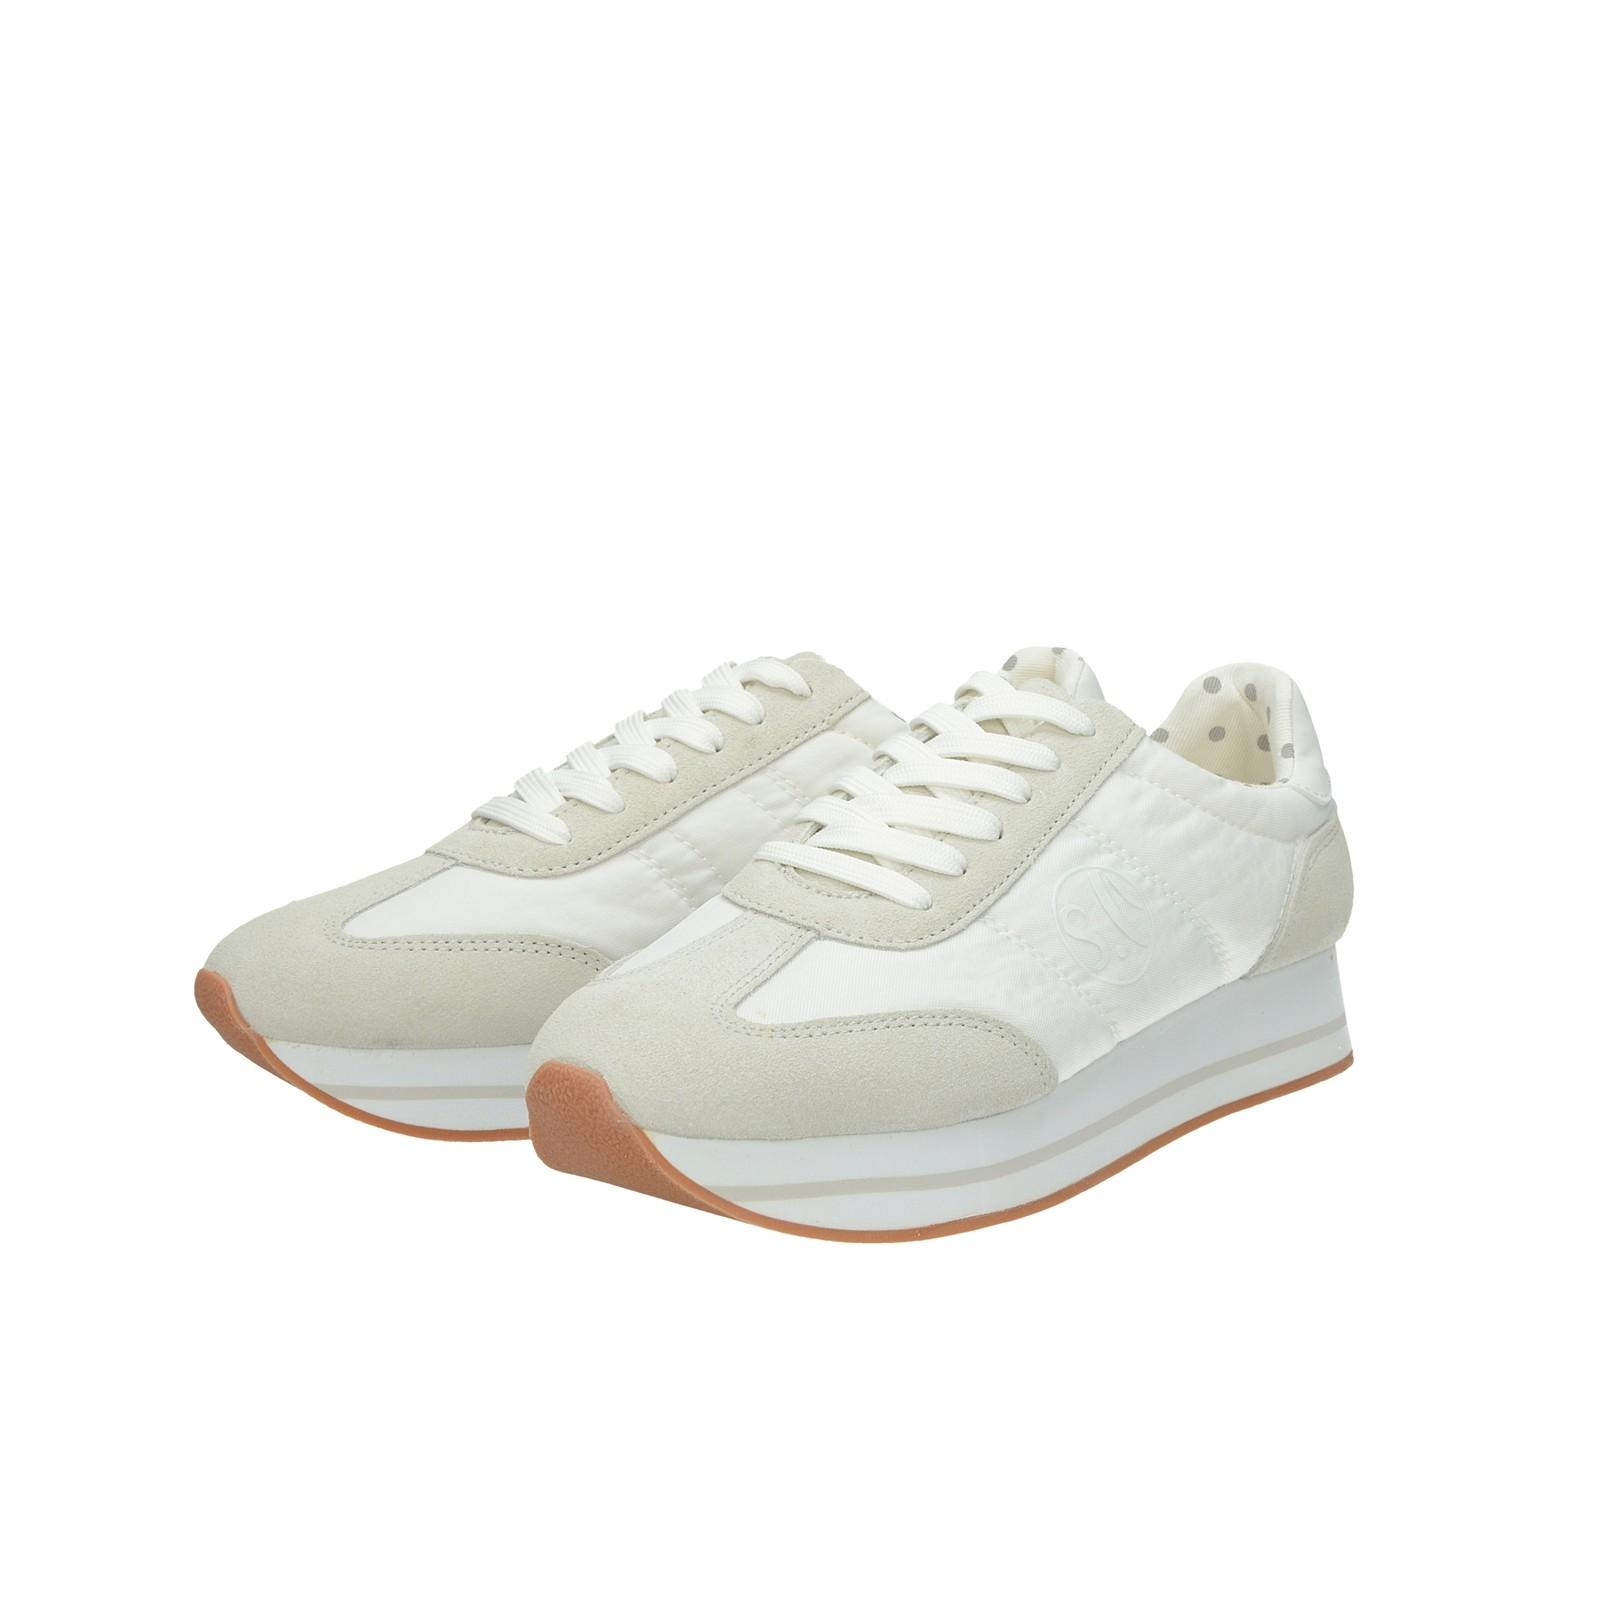 9b99389801642 S.Oliver dámske štýlové tenisky - biele | 2361222-WHT www.robel.sk